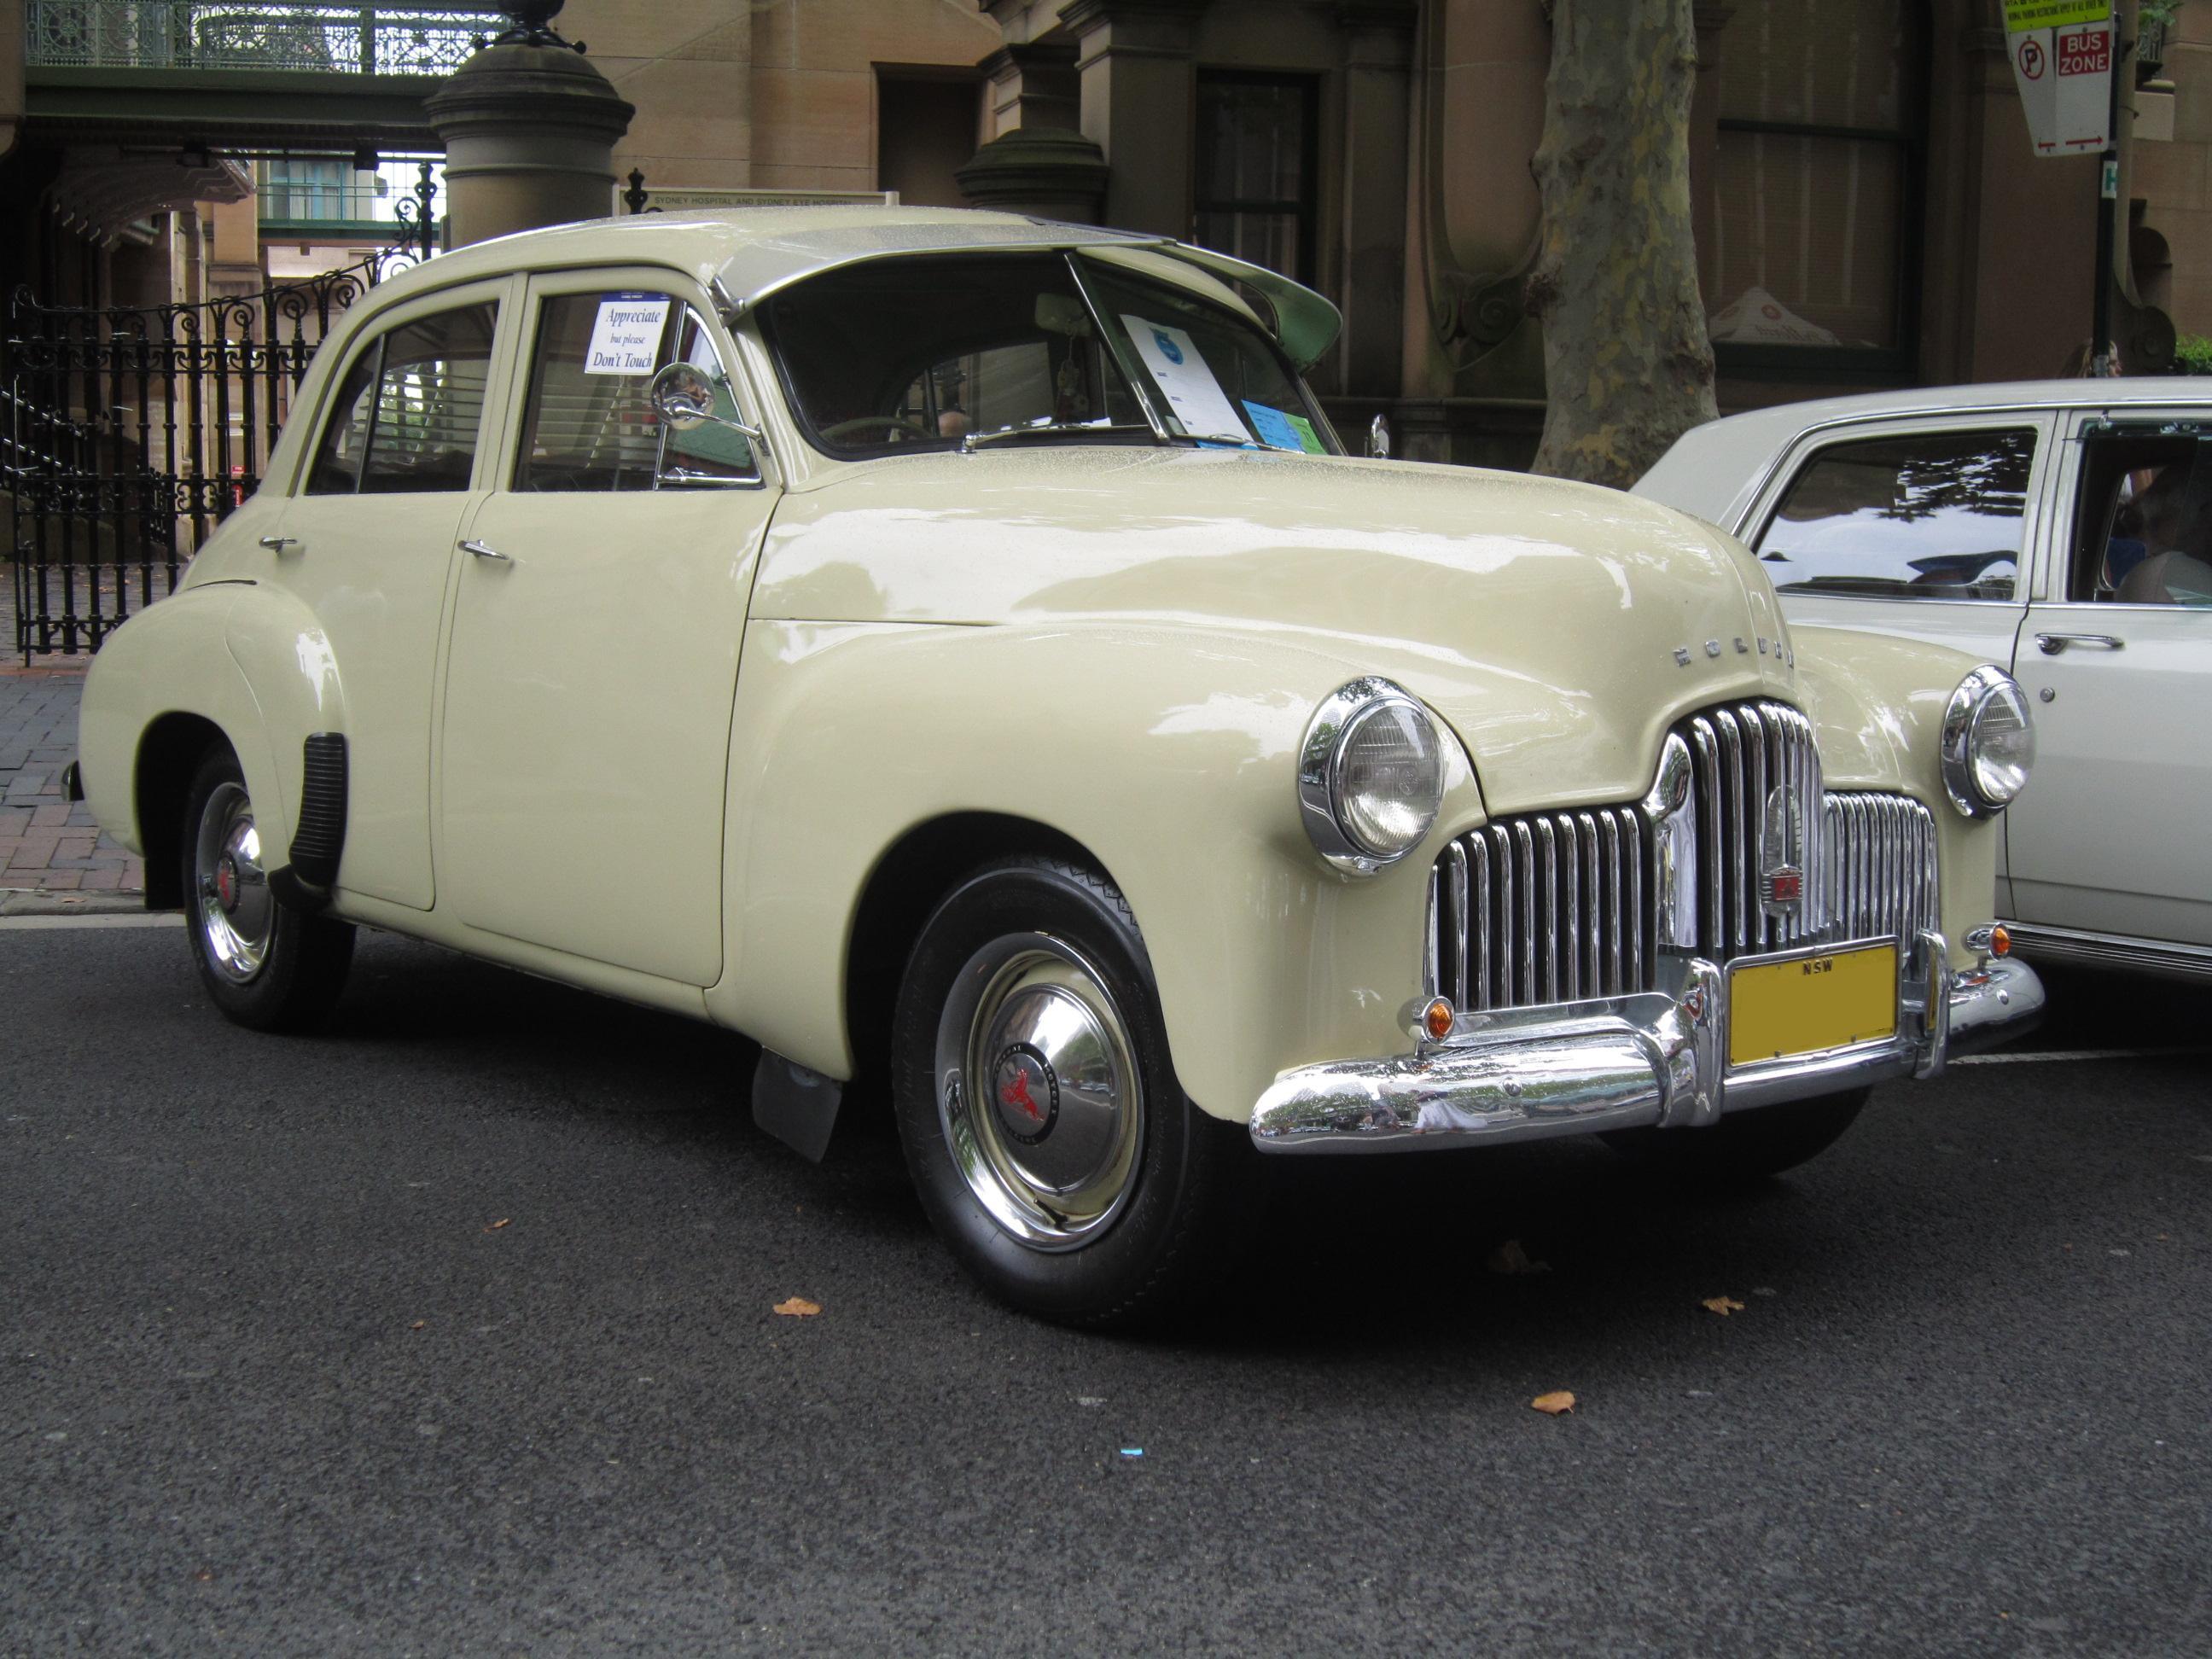 Car History Check Nrma Upcomingcarshq Com